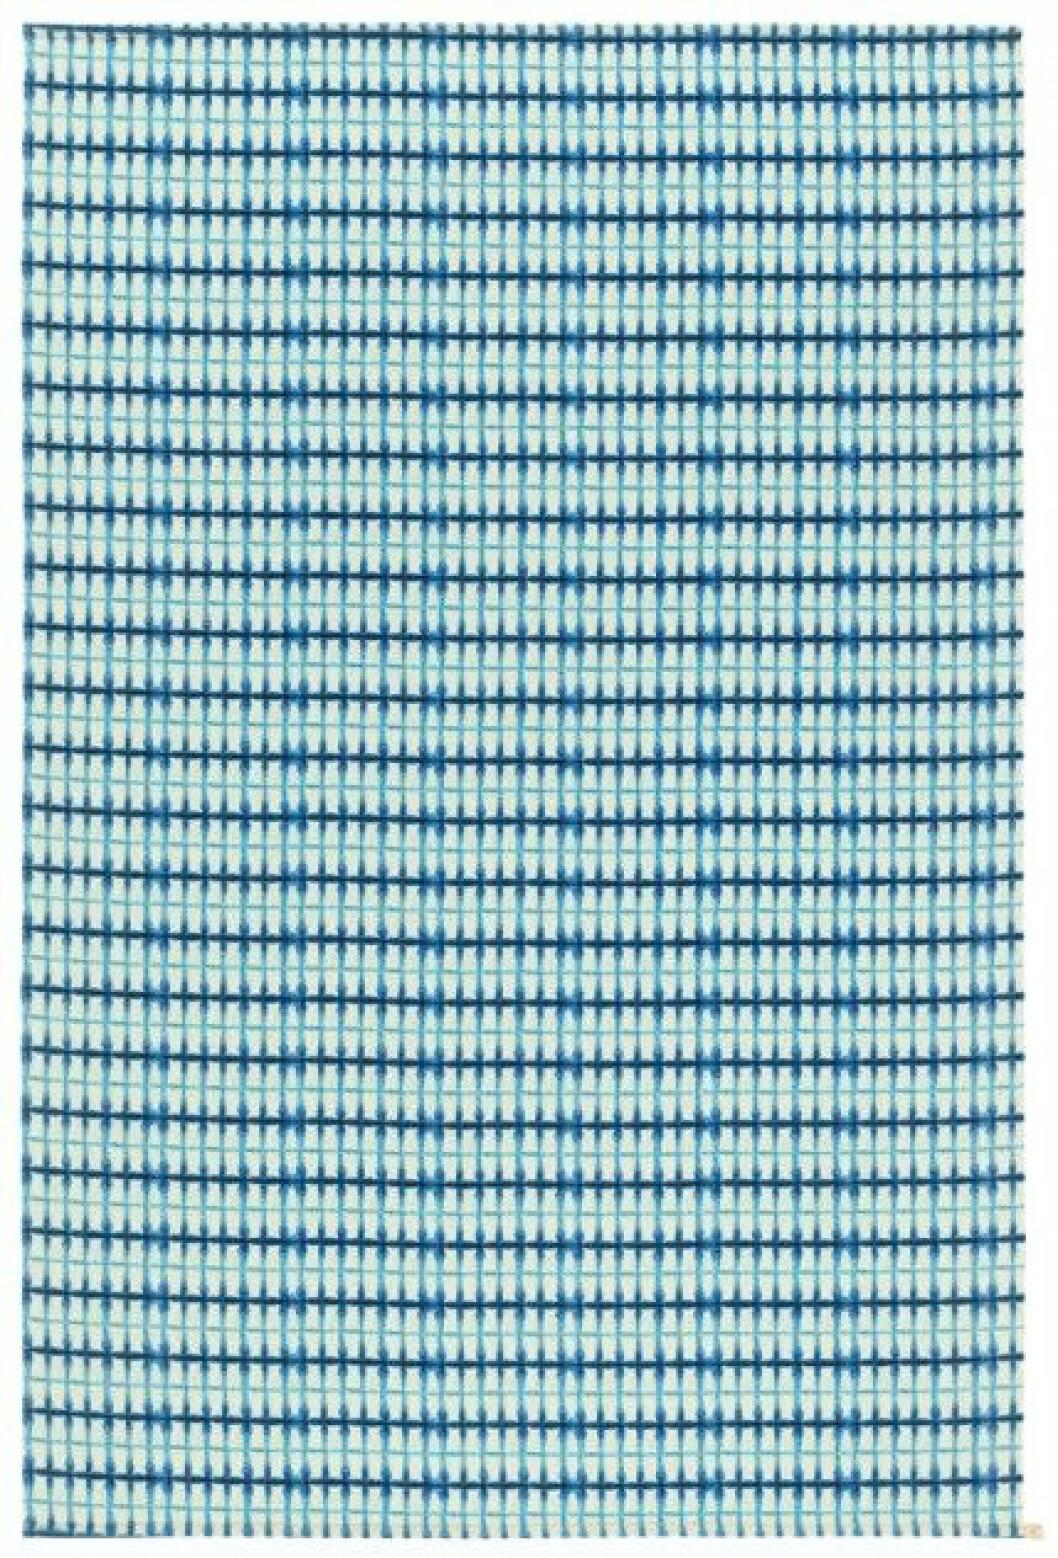 Matta Fold, design Paola Navone, 160x240 cm, 26 750 kr, Kasthall.